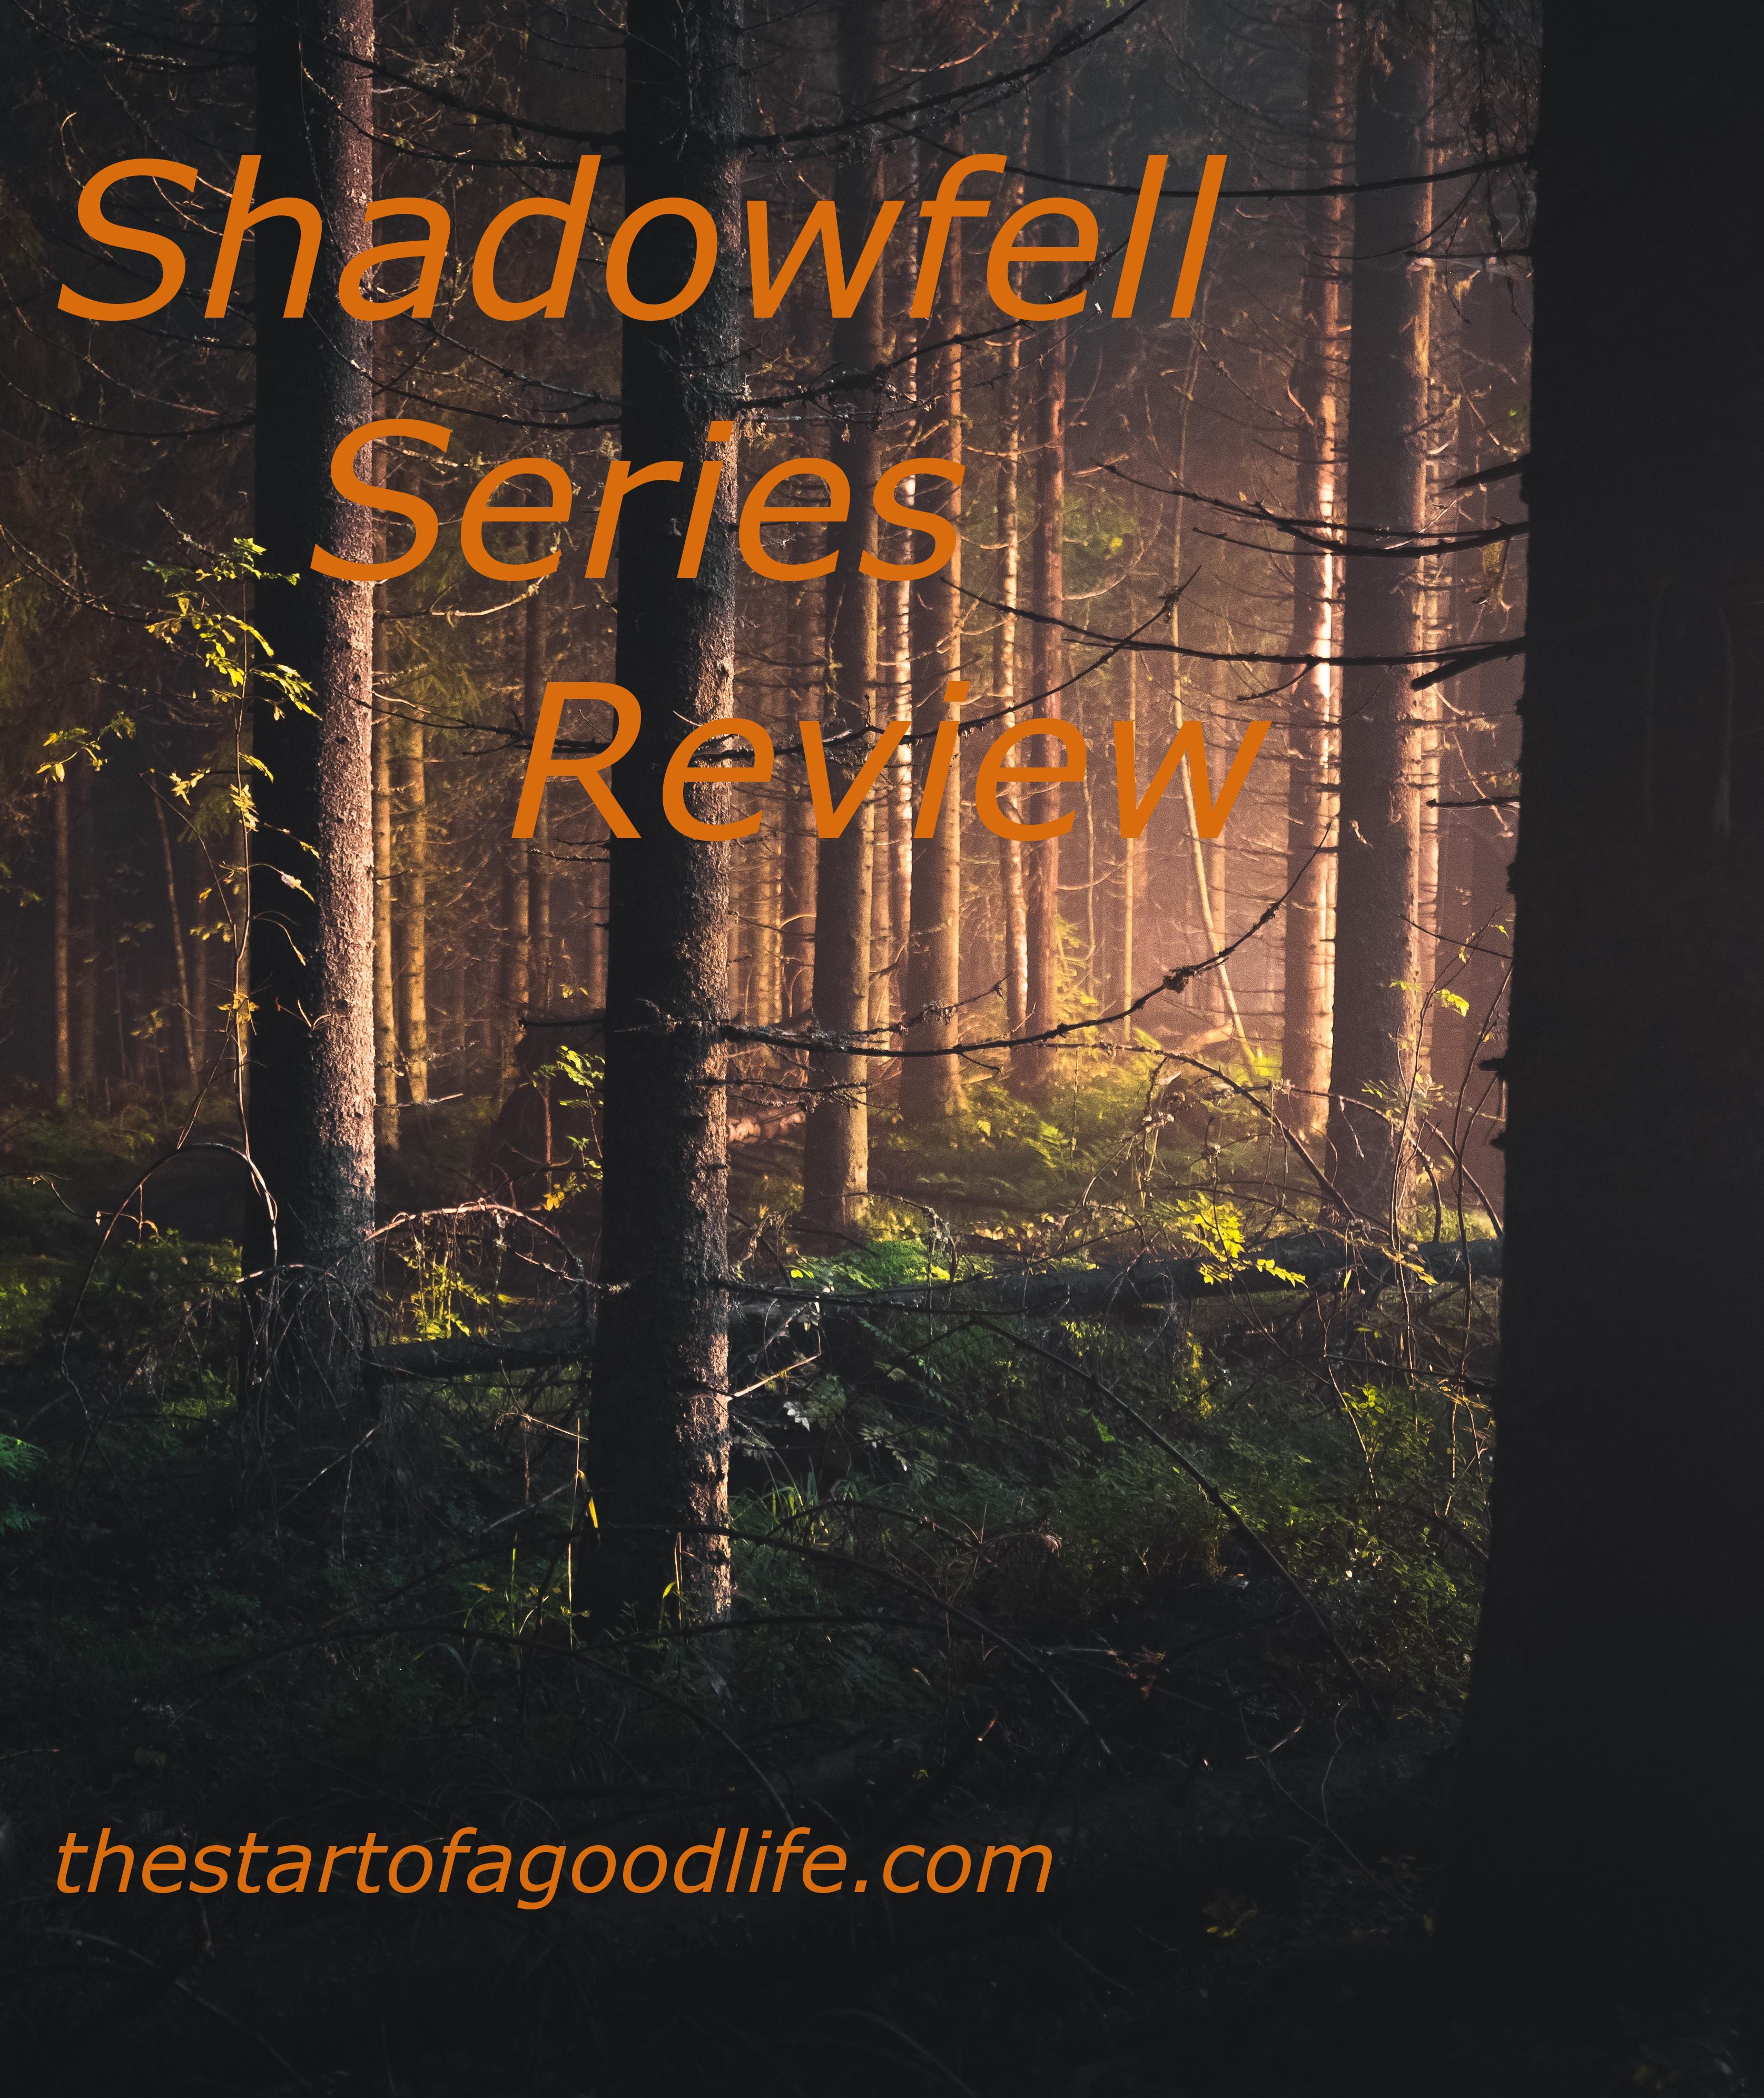 shadowfellsrsrvw